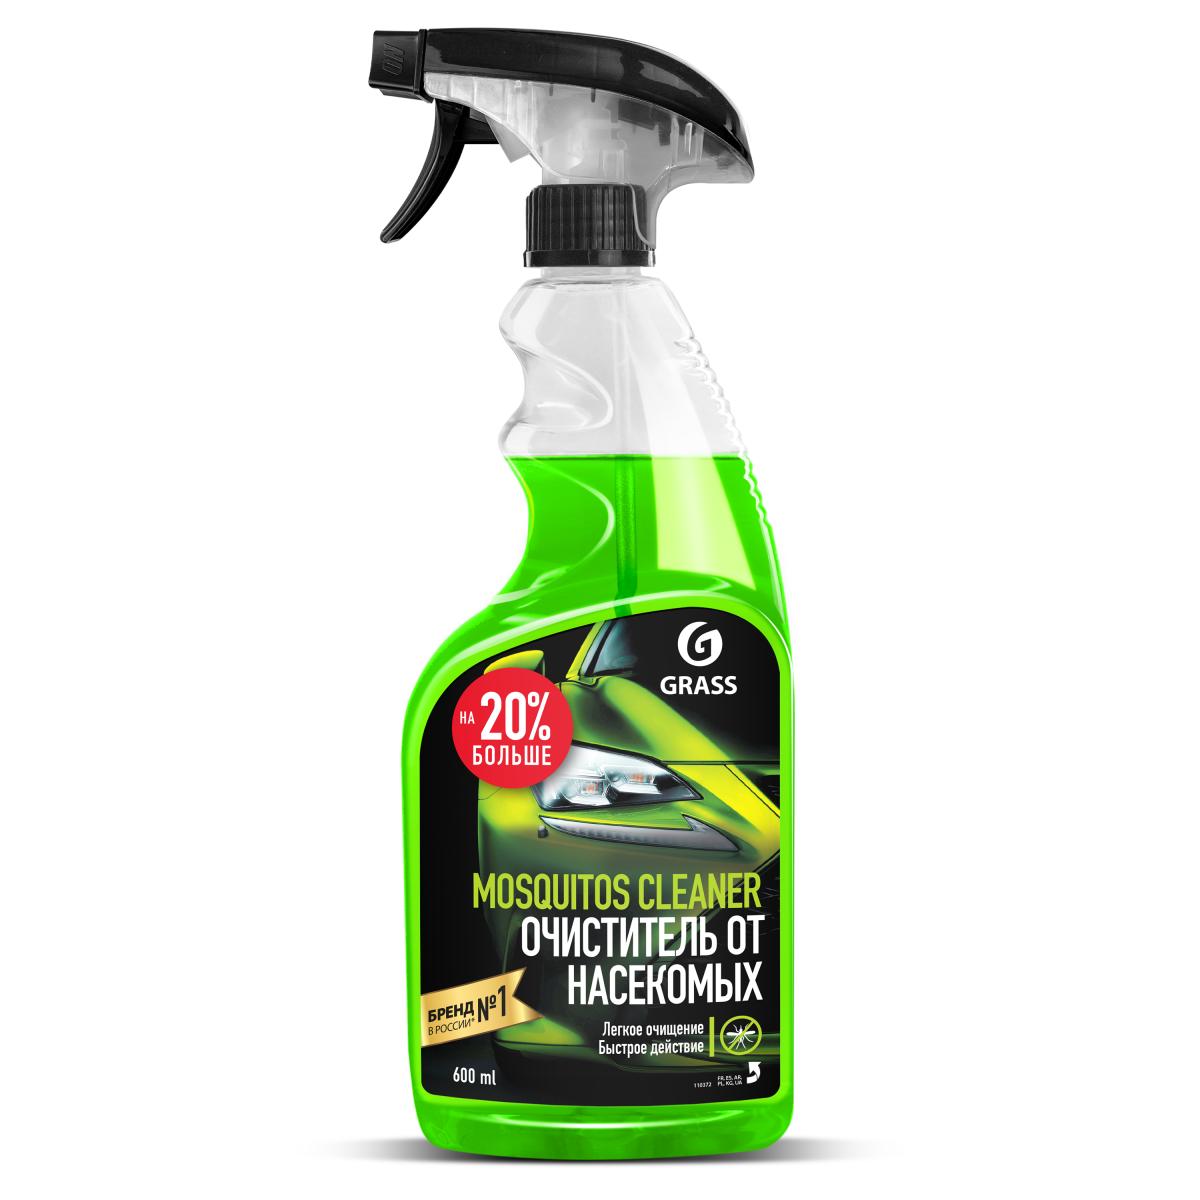 Анти-москитное средство Grass Mosquitos Cleaner 0.6 л